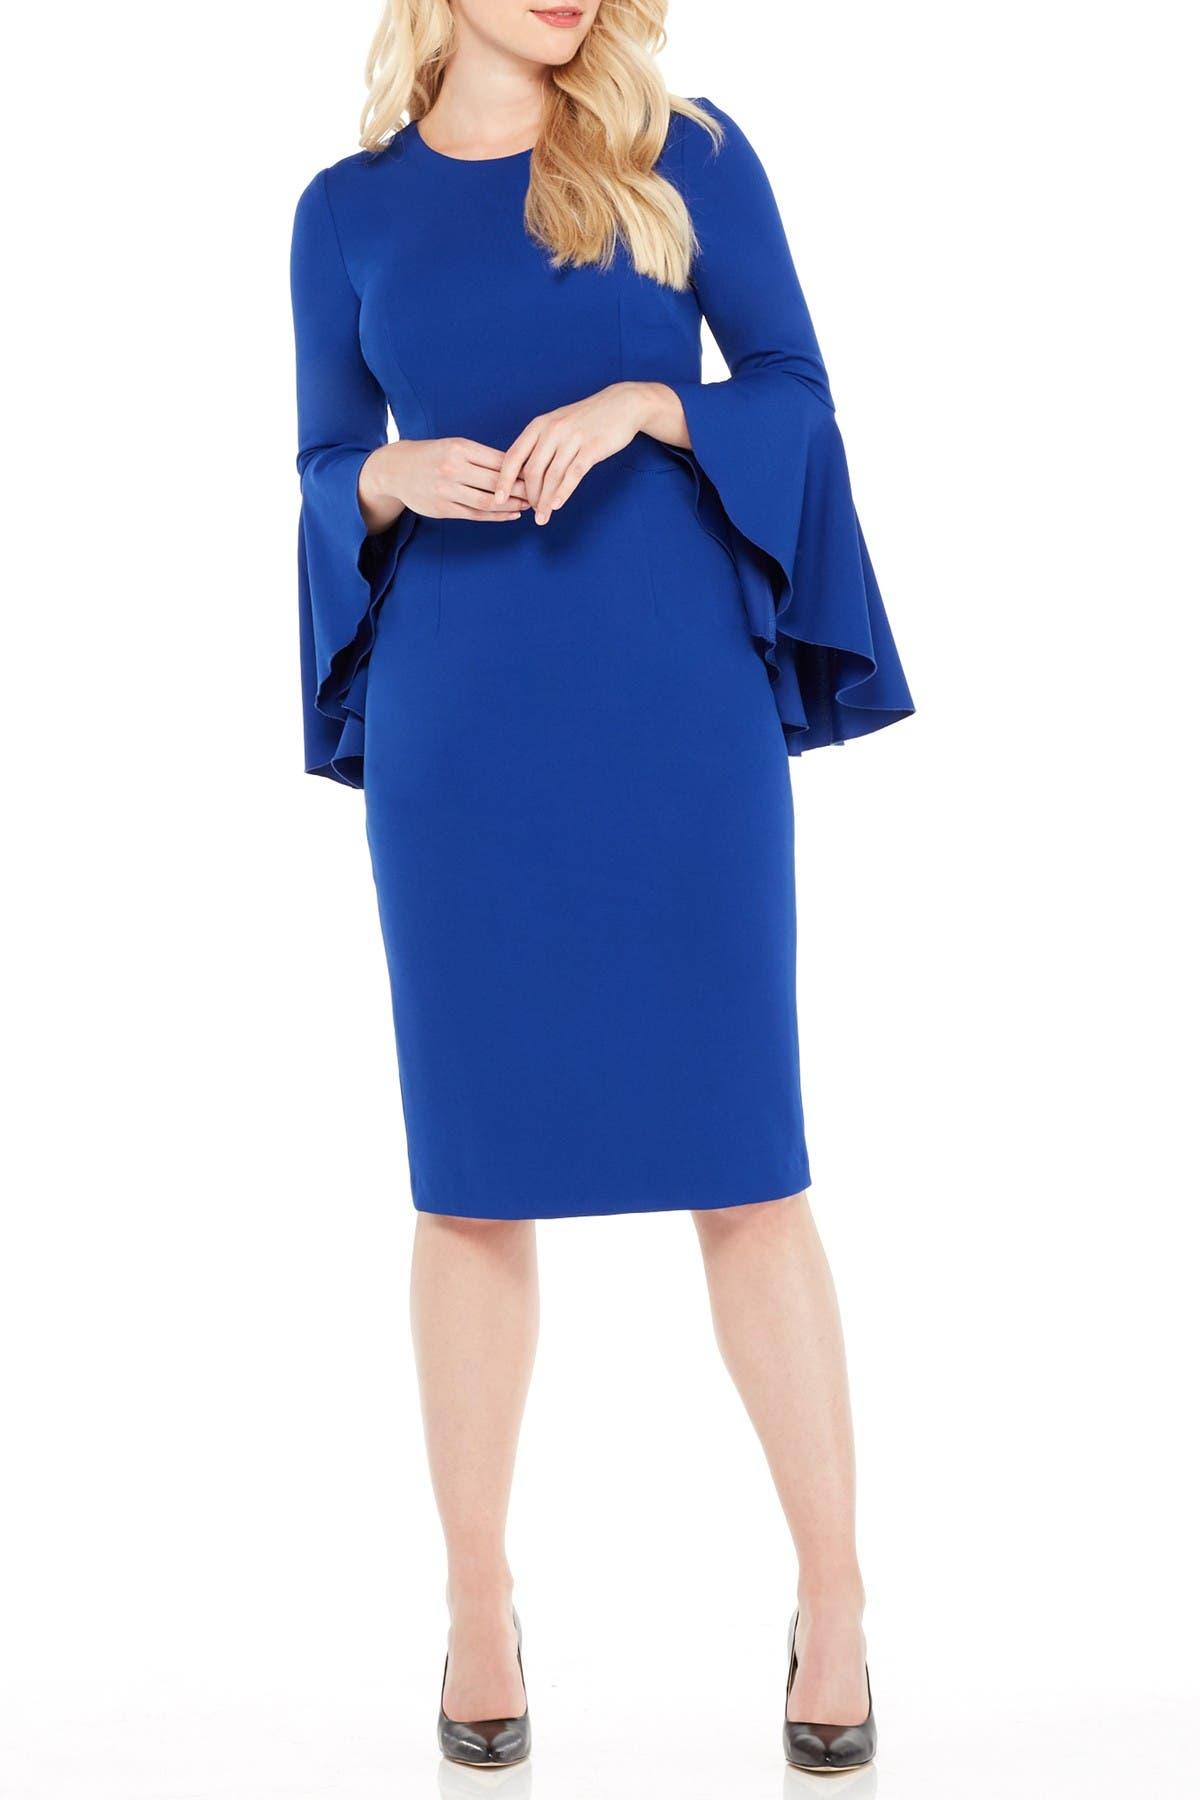 Image of Maggy London Sasha Bell Sleeve Midi Dress